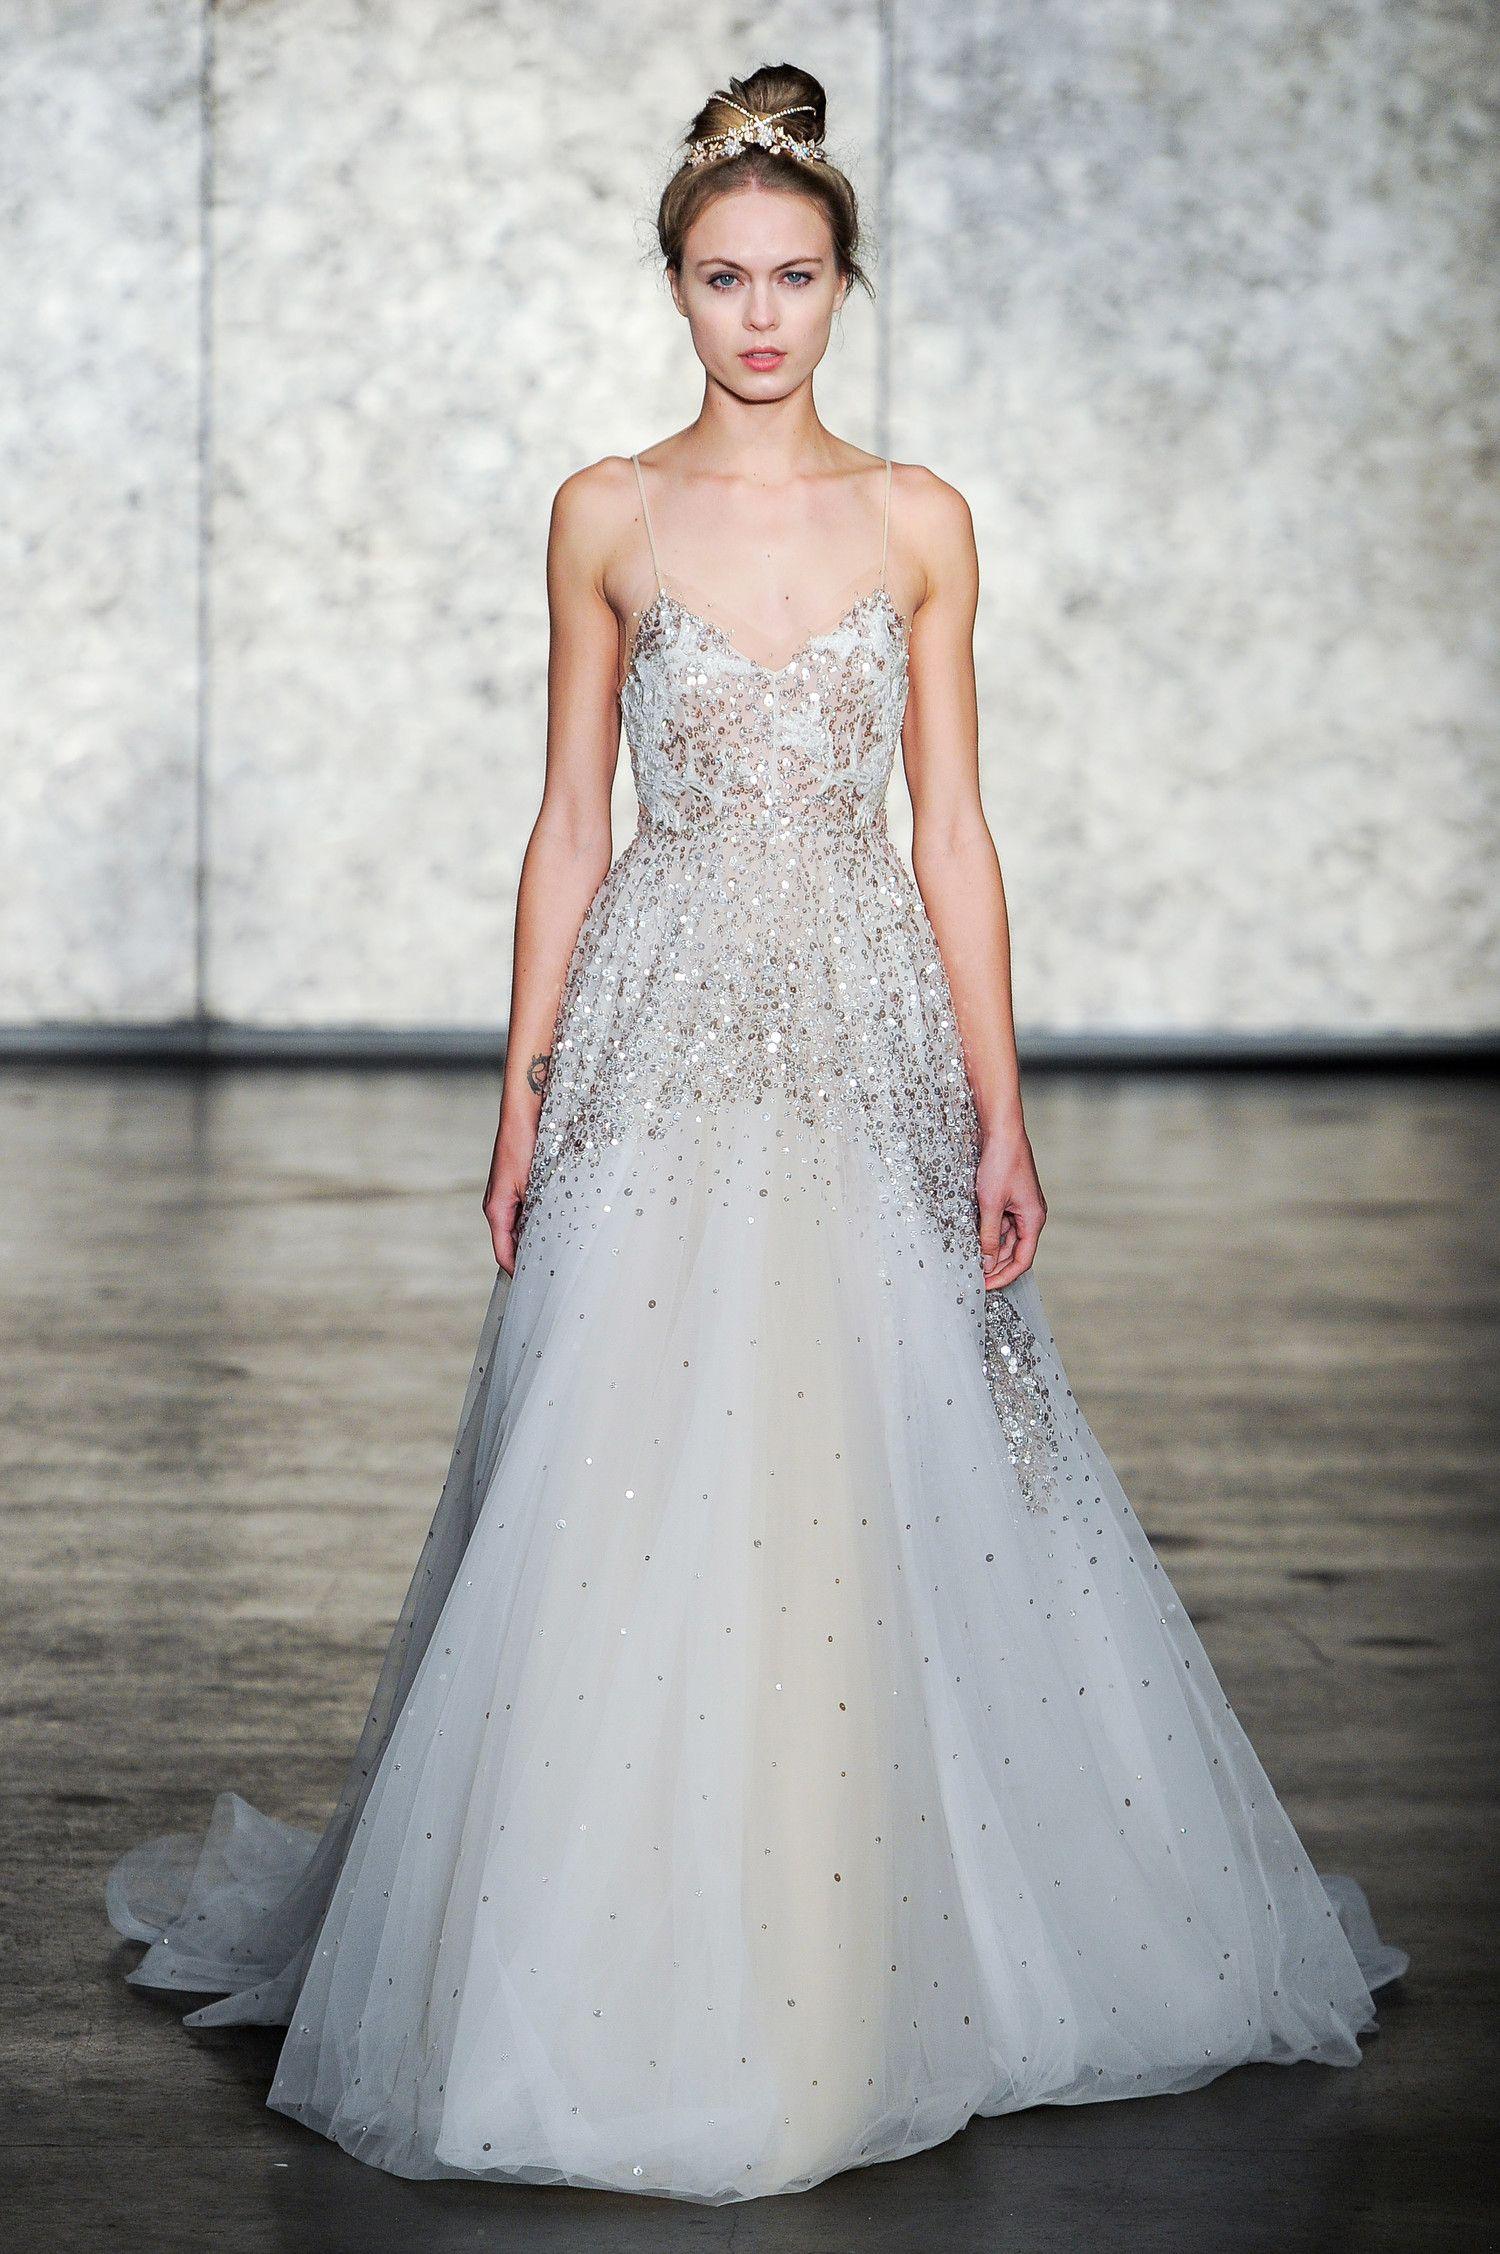 Metallic Wedding Dresses 2018